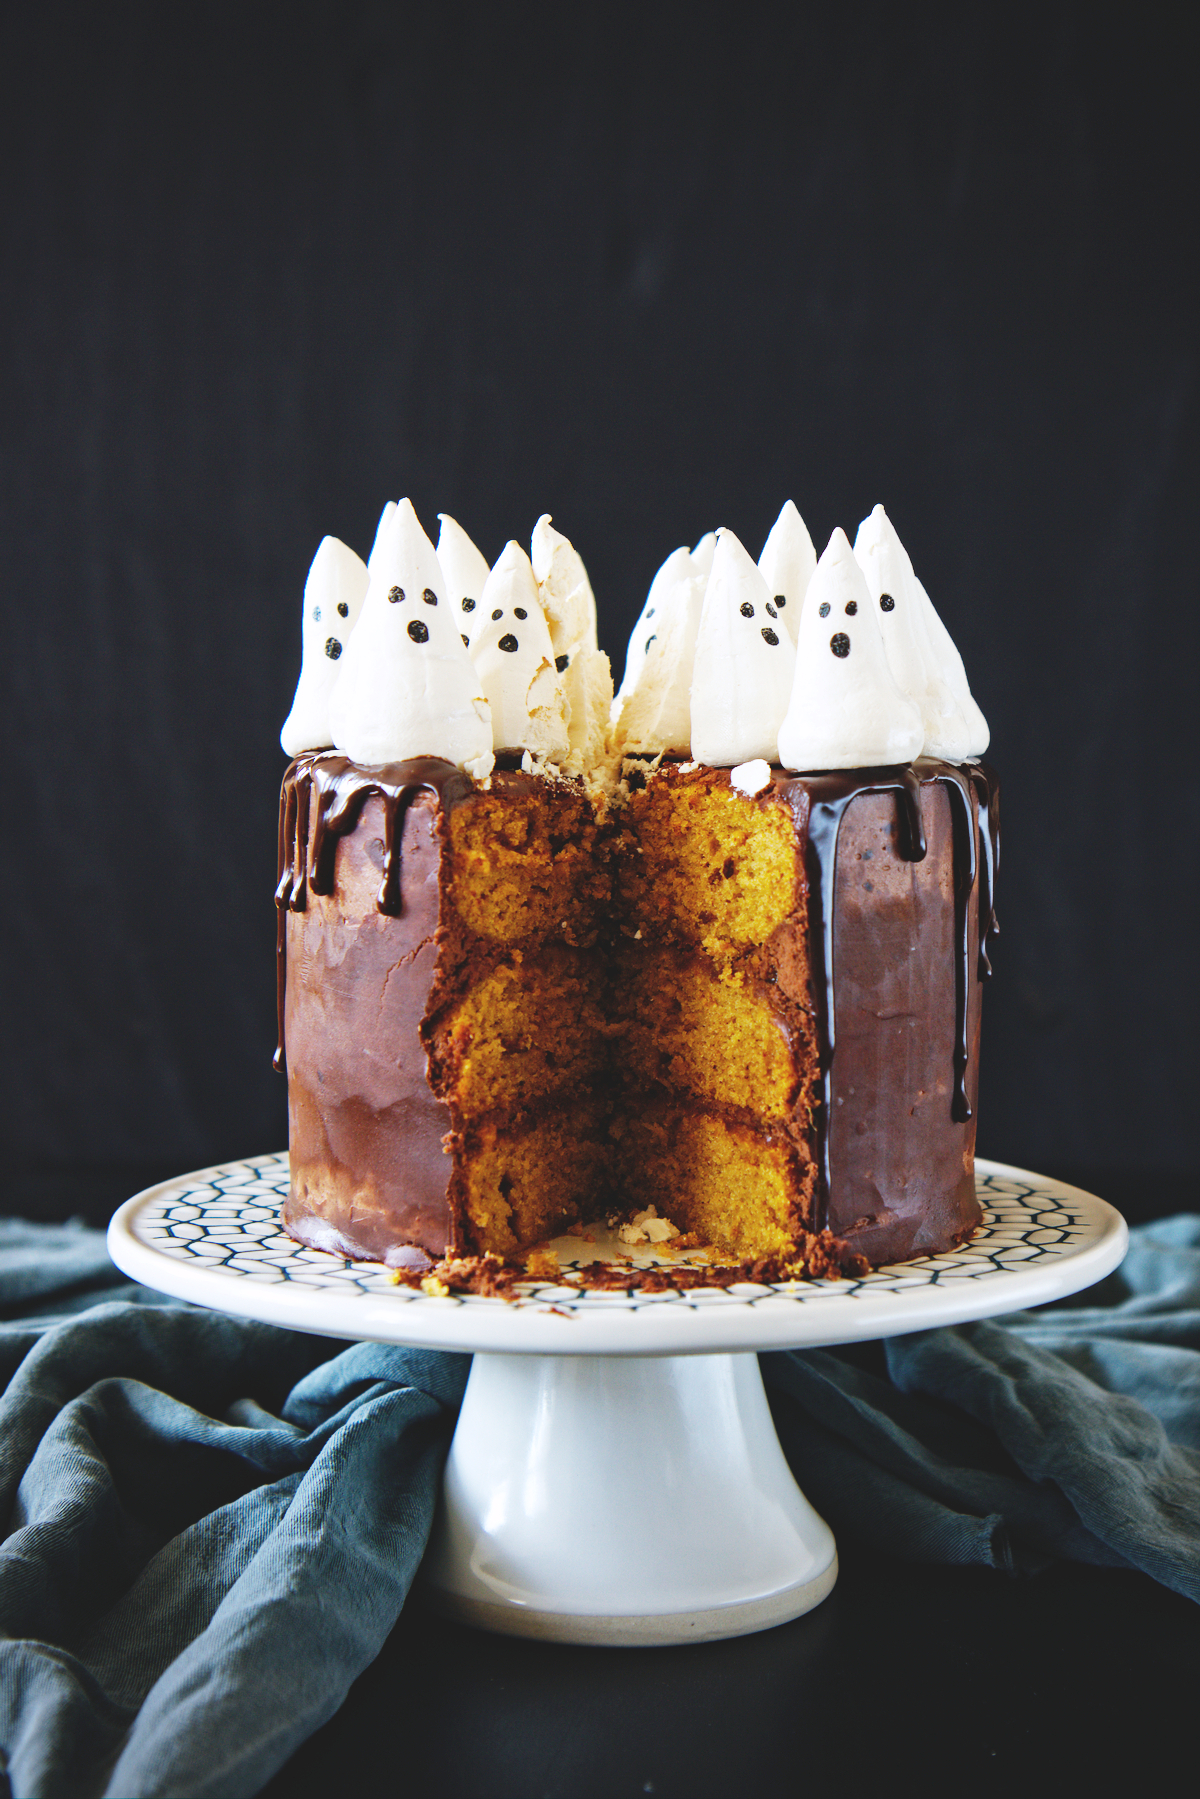 Spooky Chocolate Pumpkin Cake | La Pêche Fraîche